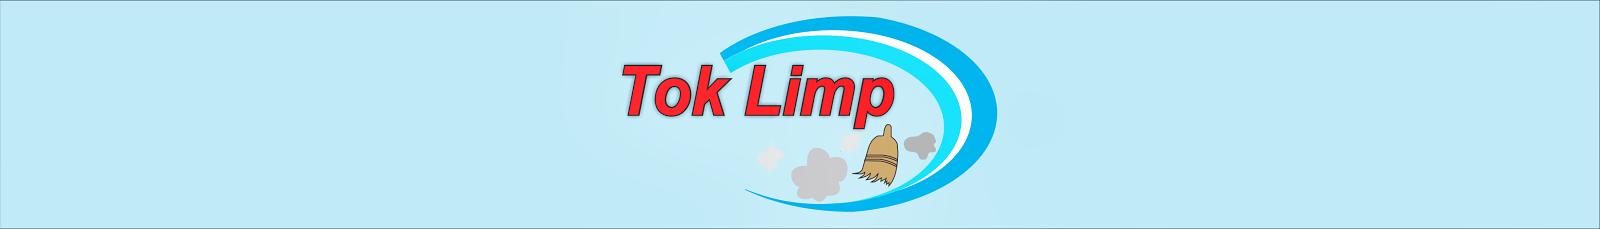 tok limp